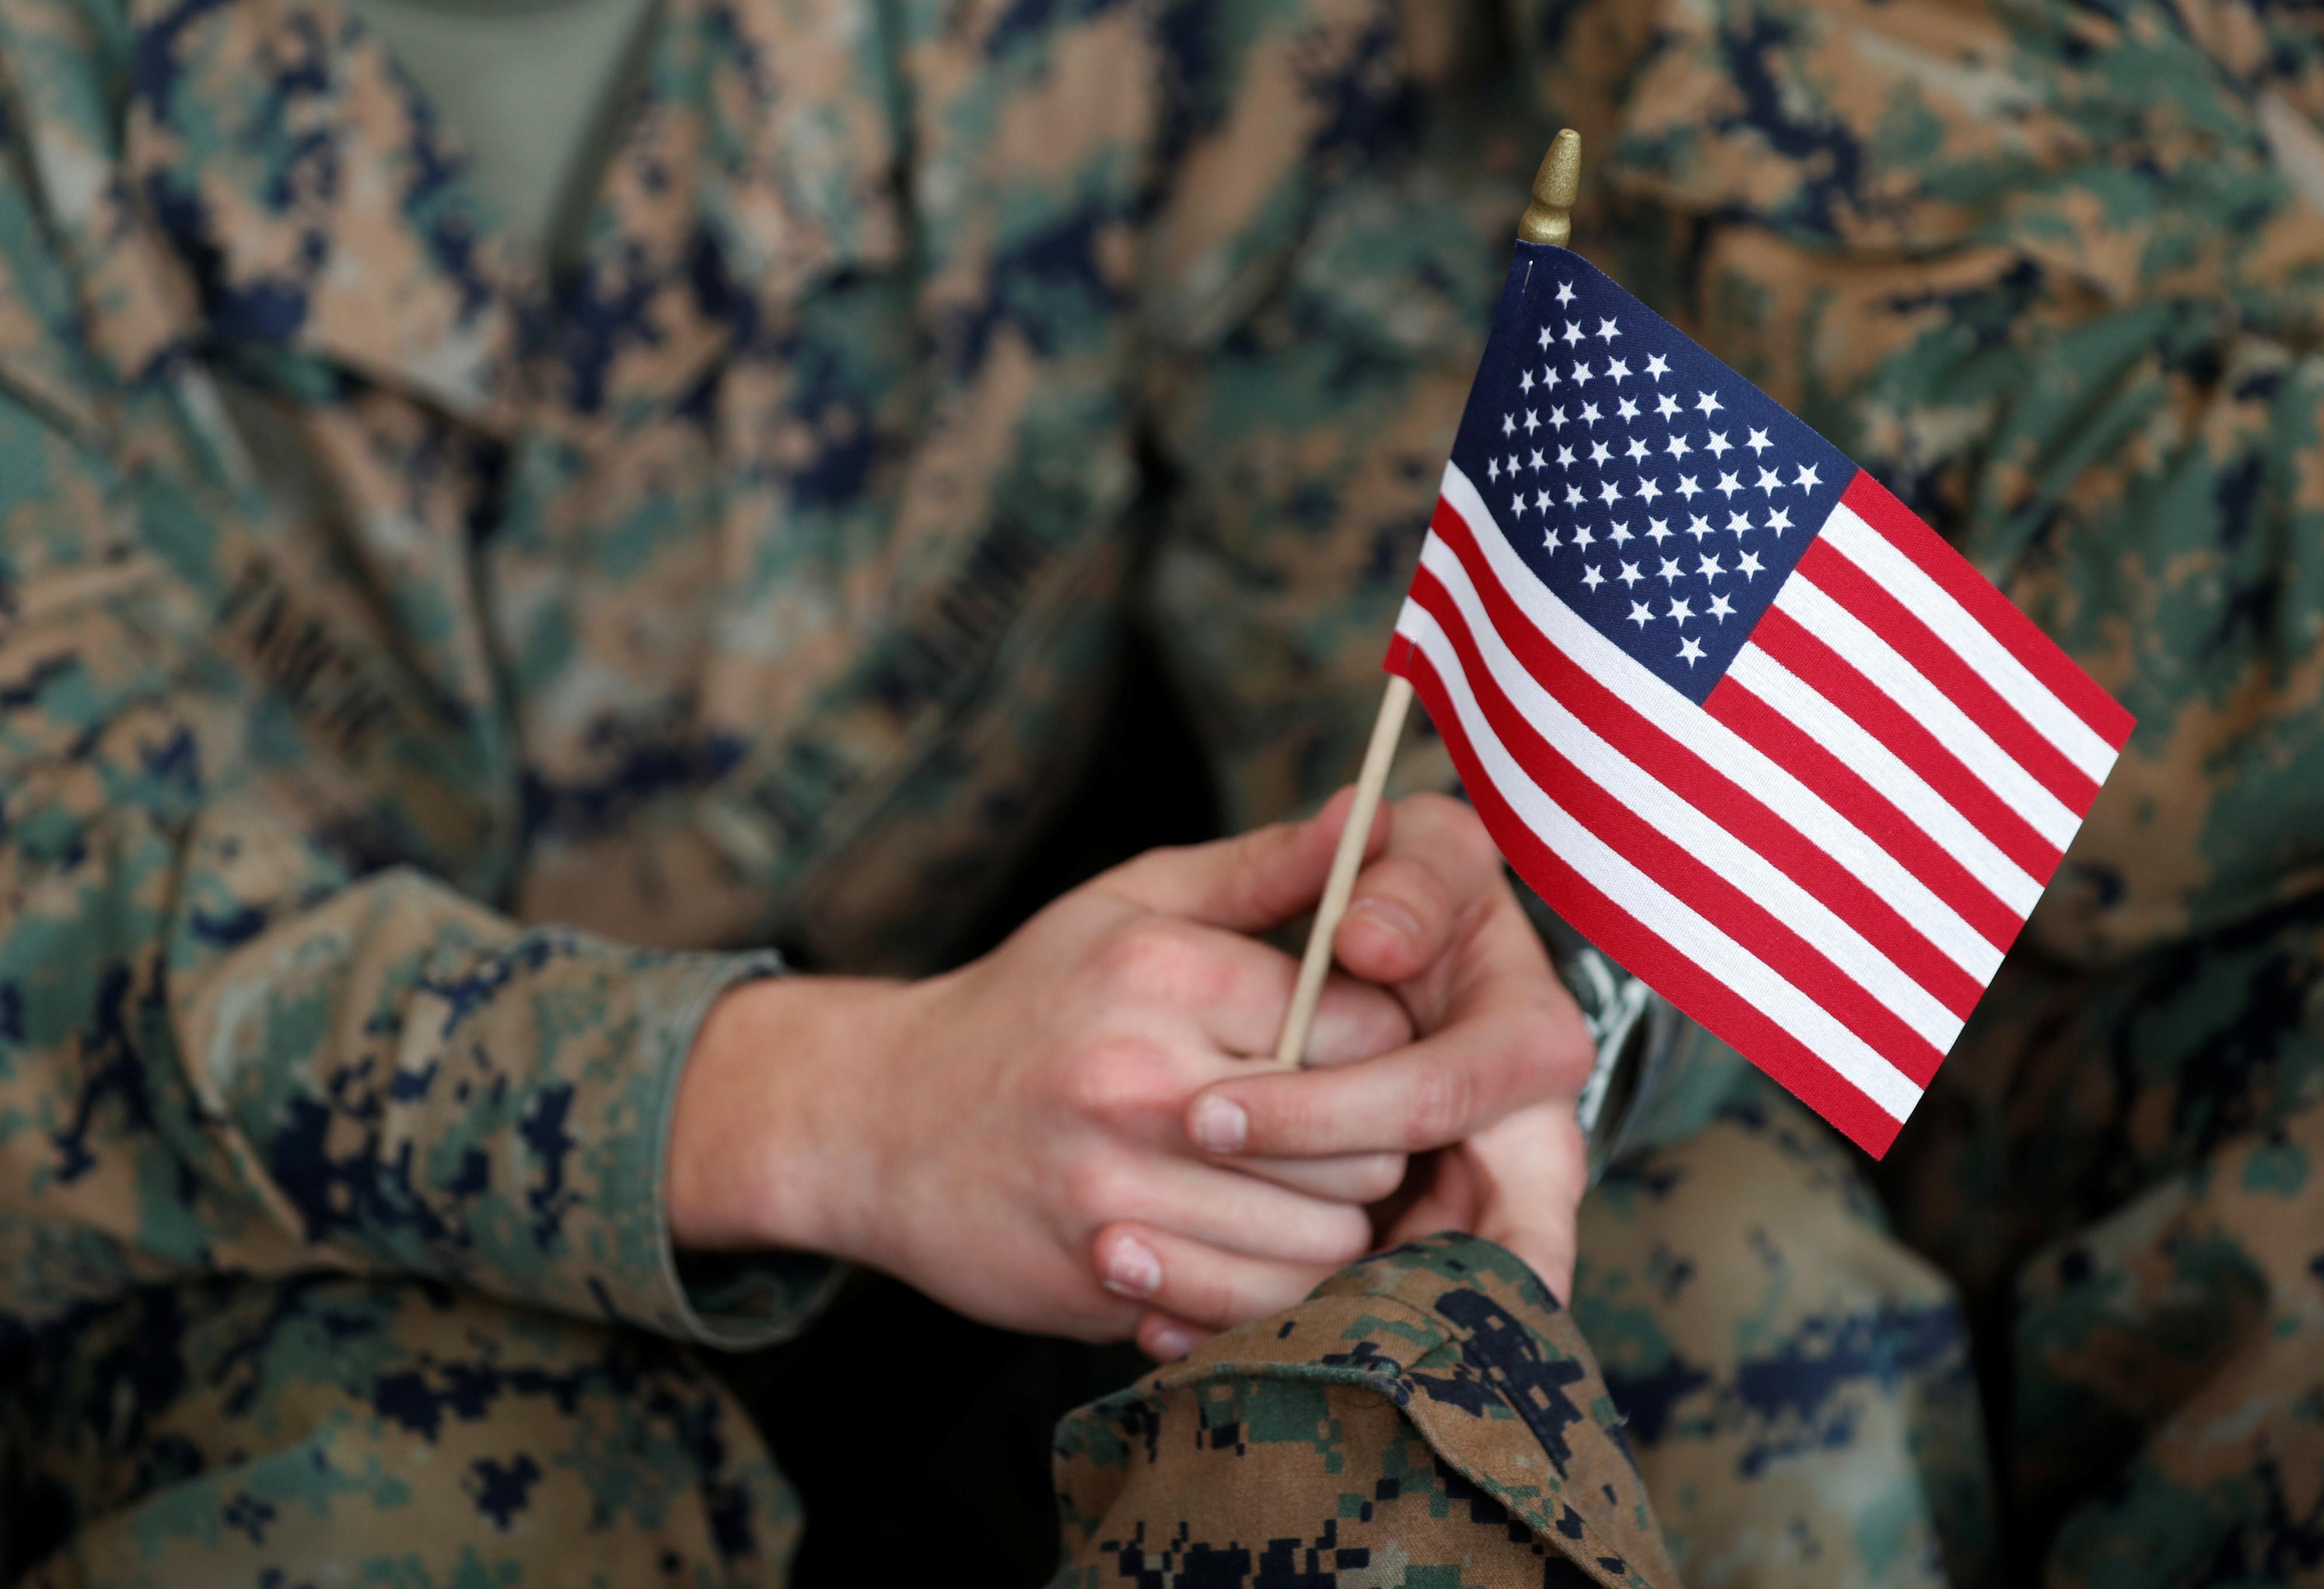 Military worship hurts US democracy